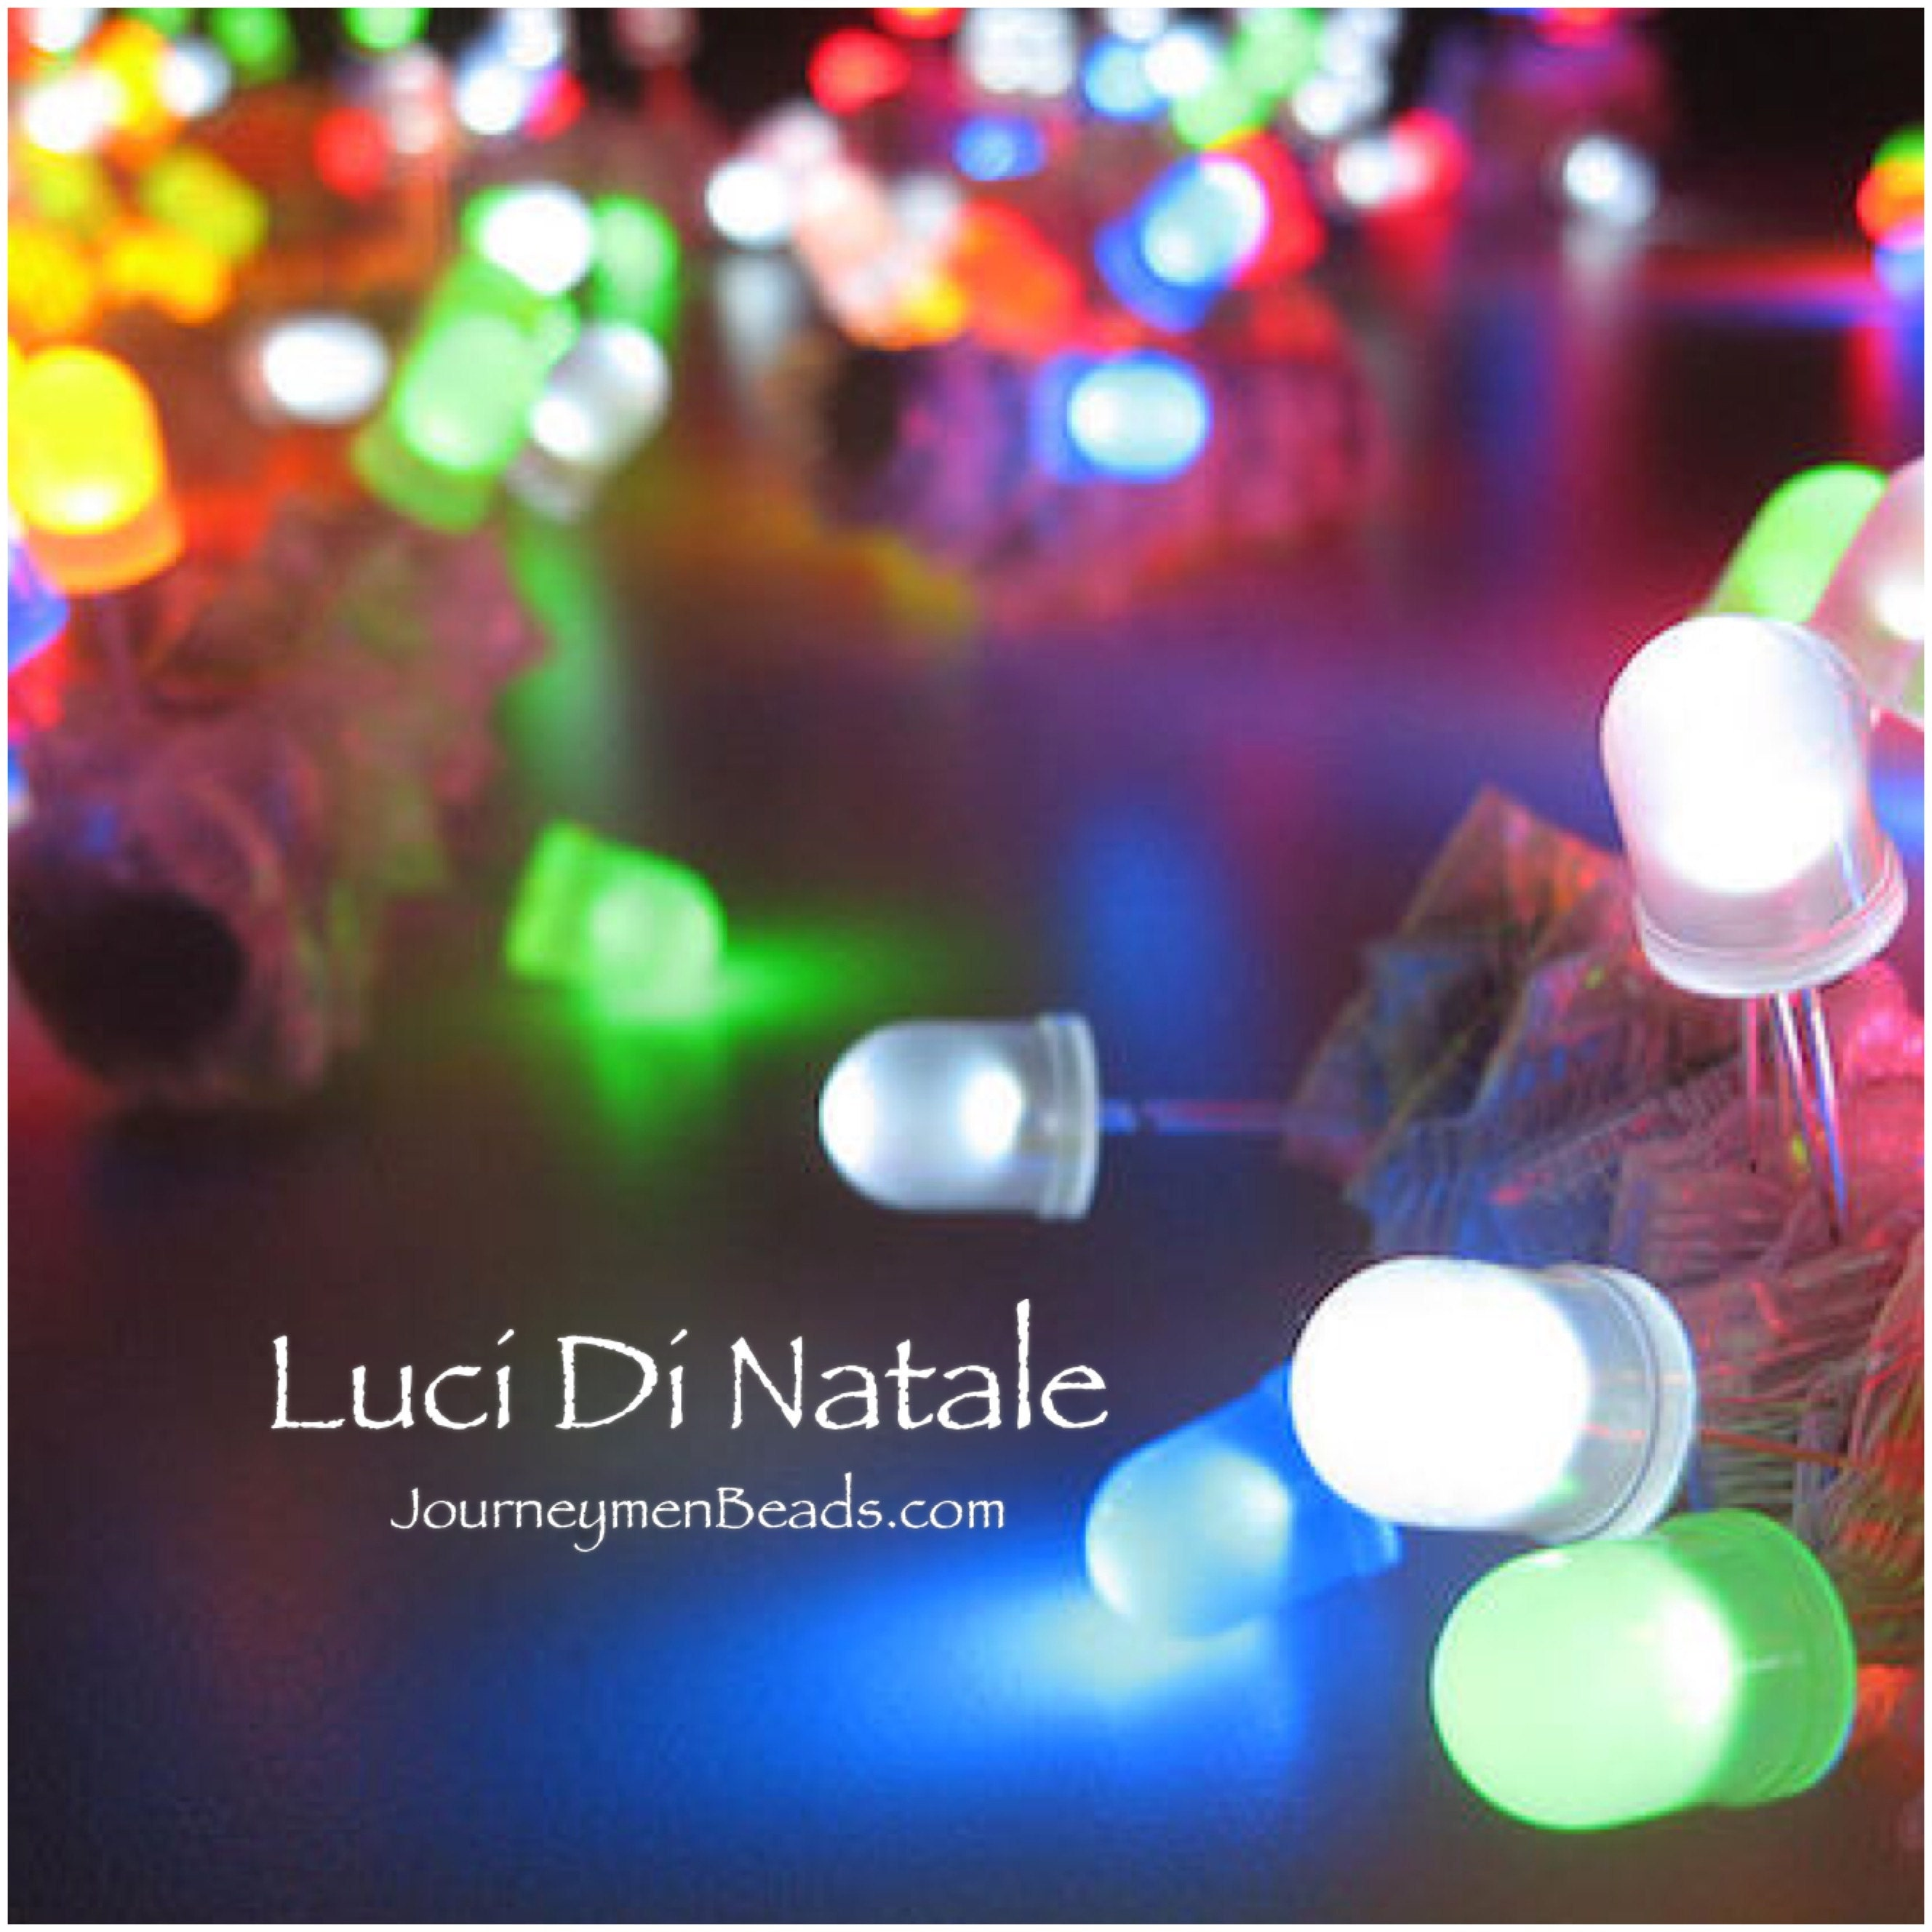 Our always popular Holiday bracelet Luci De Natale at JourneymenBeads.com